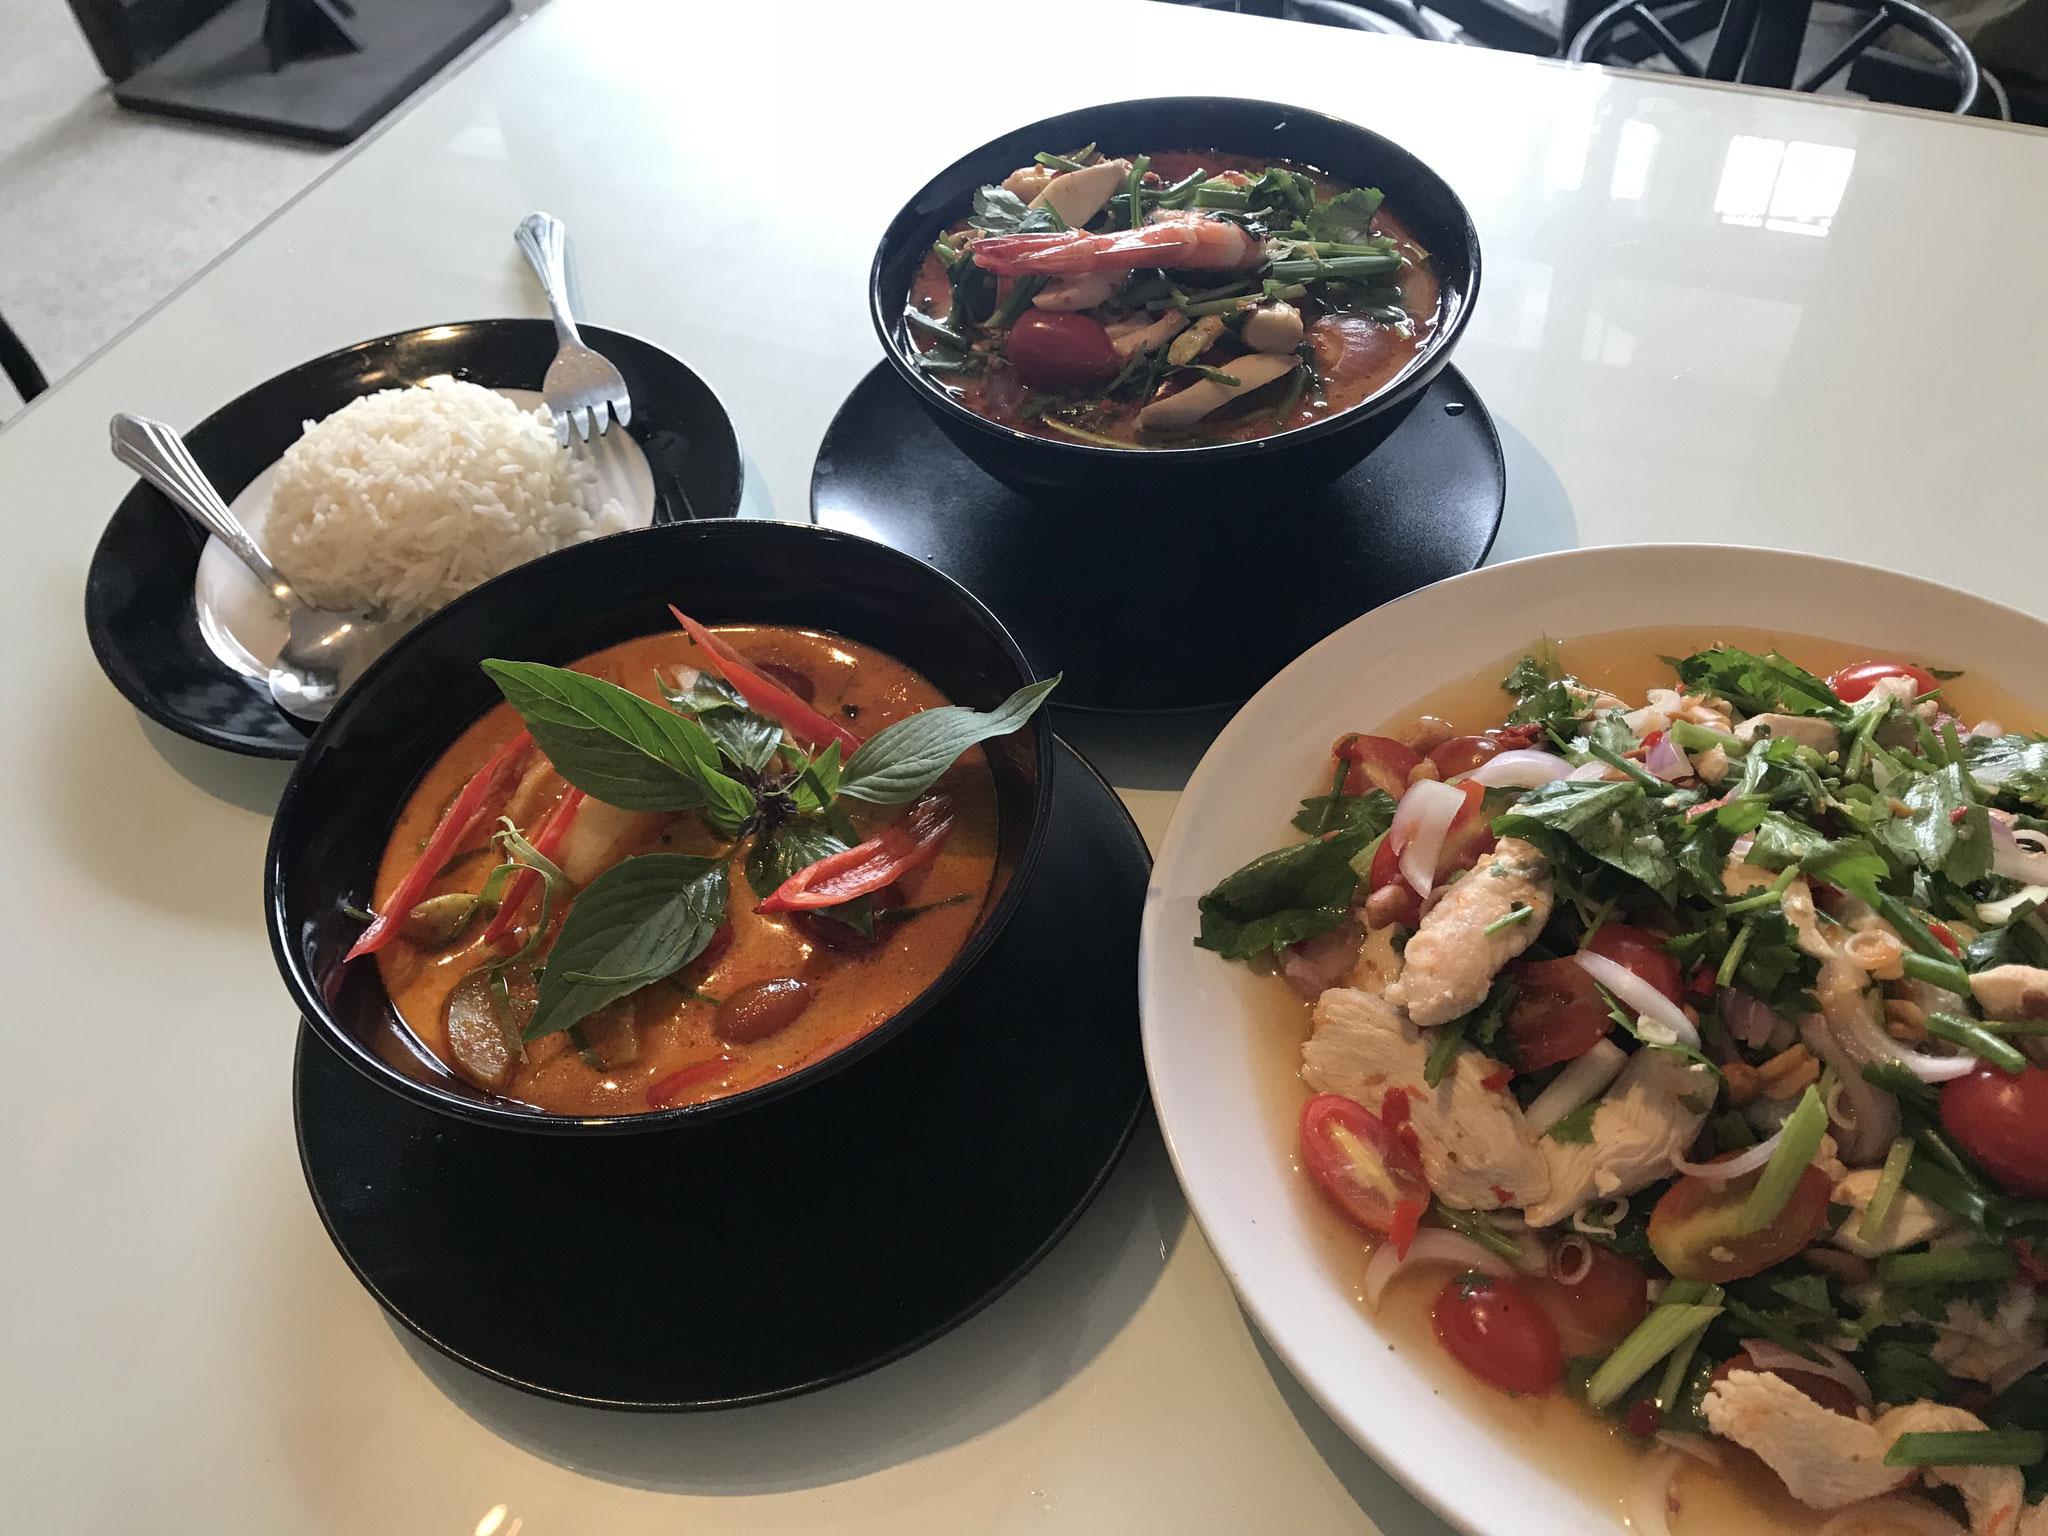 Penang Curry, Tom Yam Gung, Yam Gai